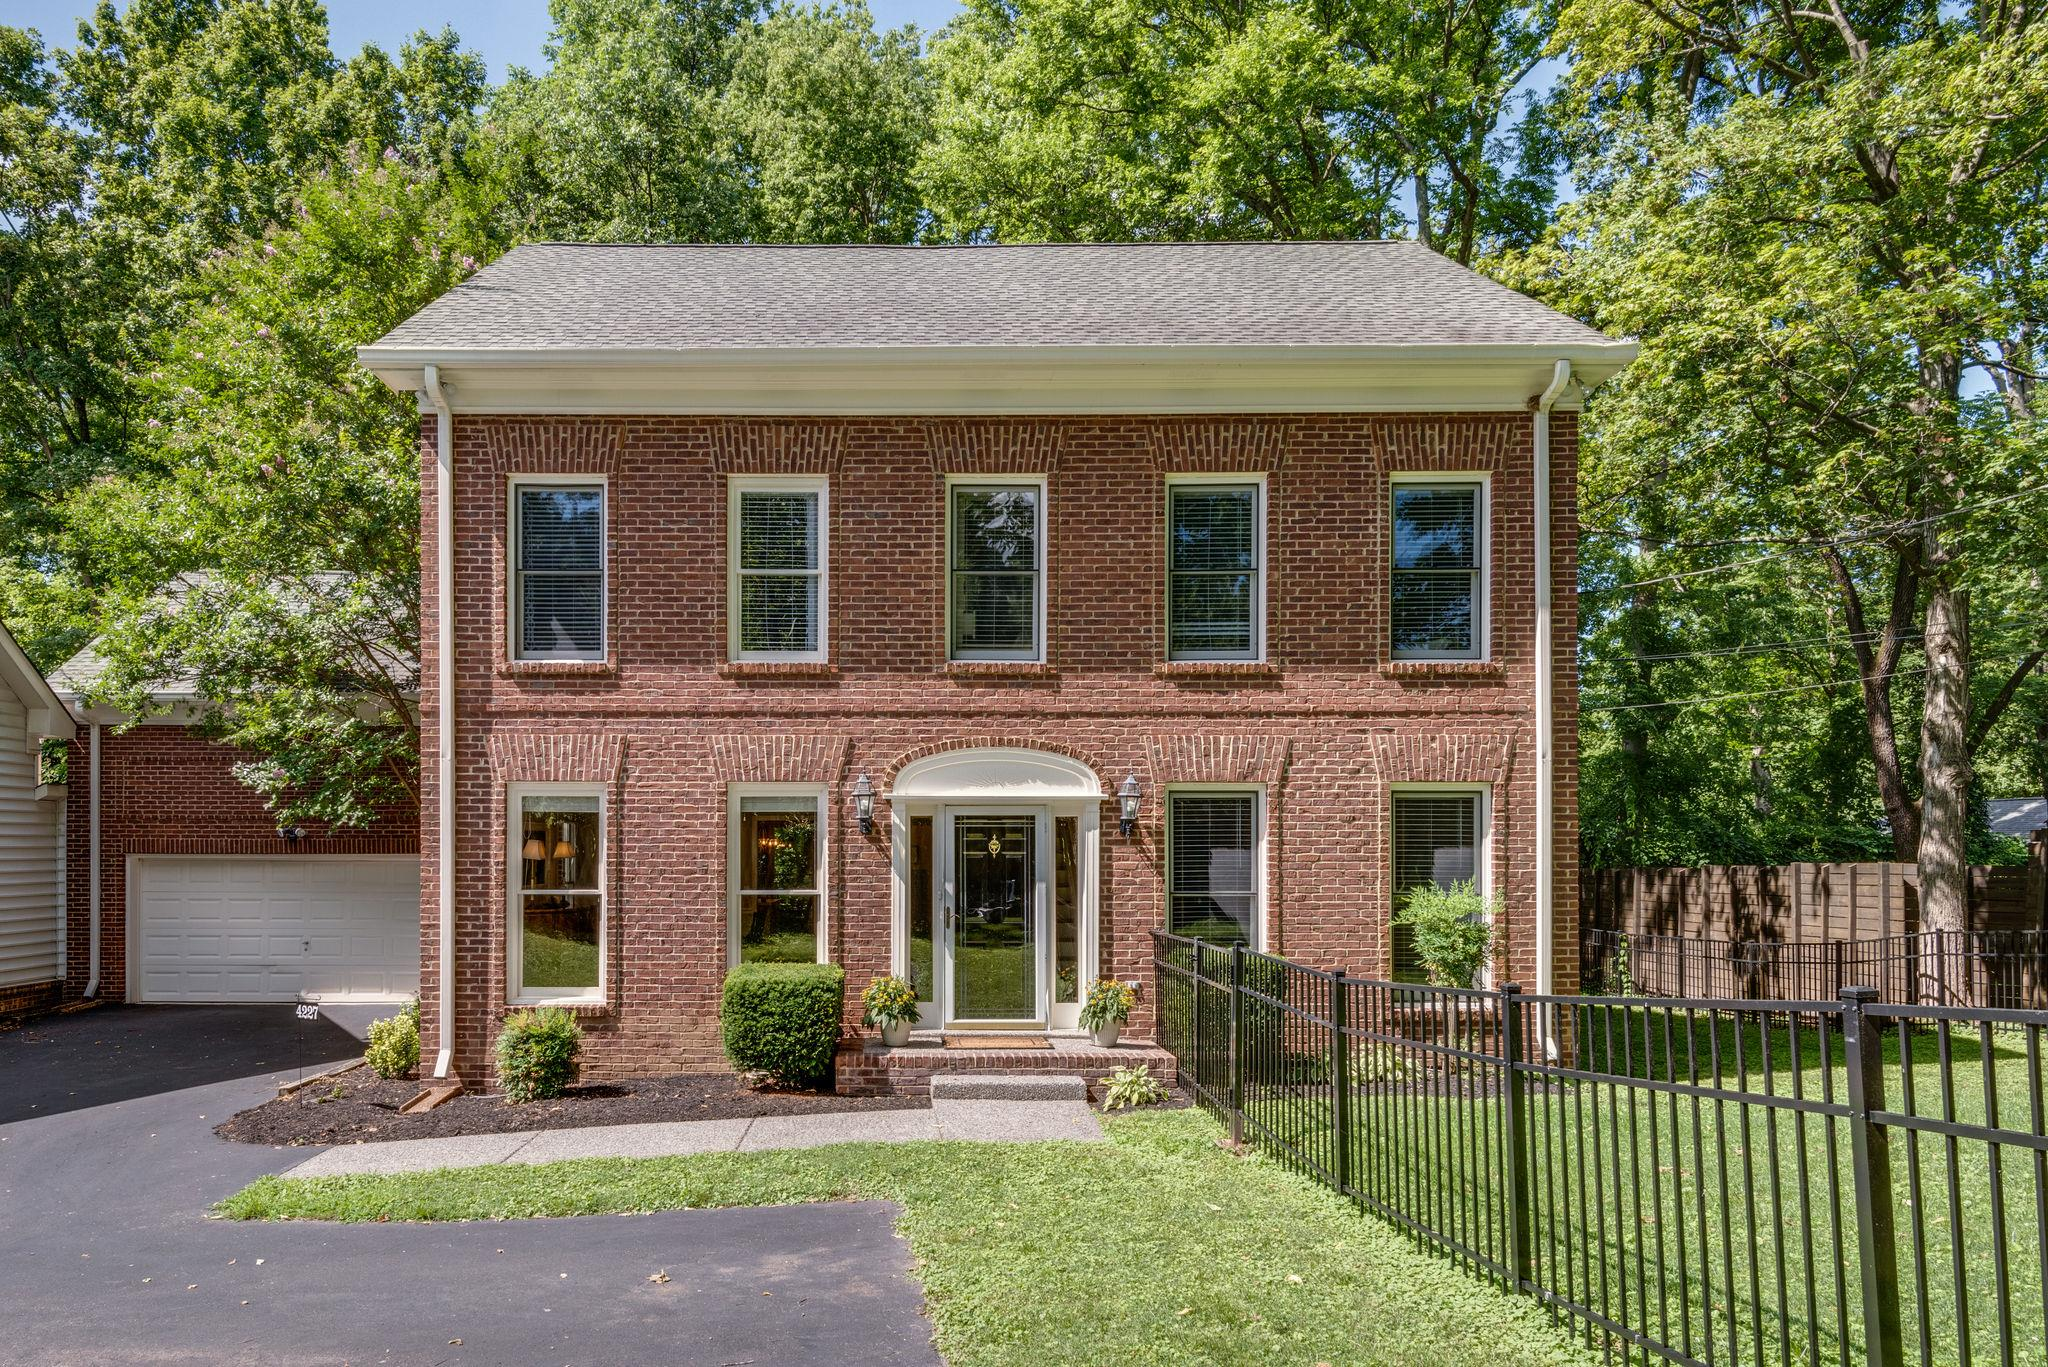 4227 Savannah Pl, Nashville, TN 37204 - Nashville, TN real estate listing